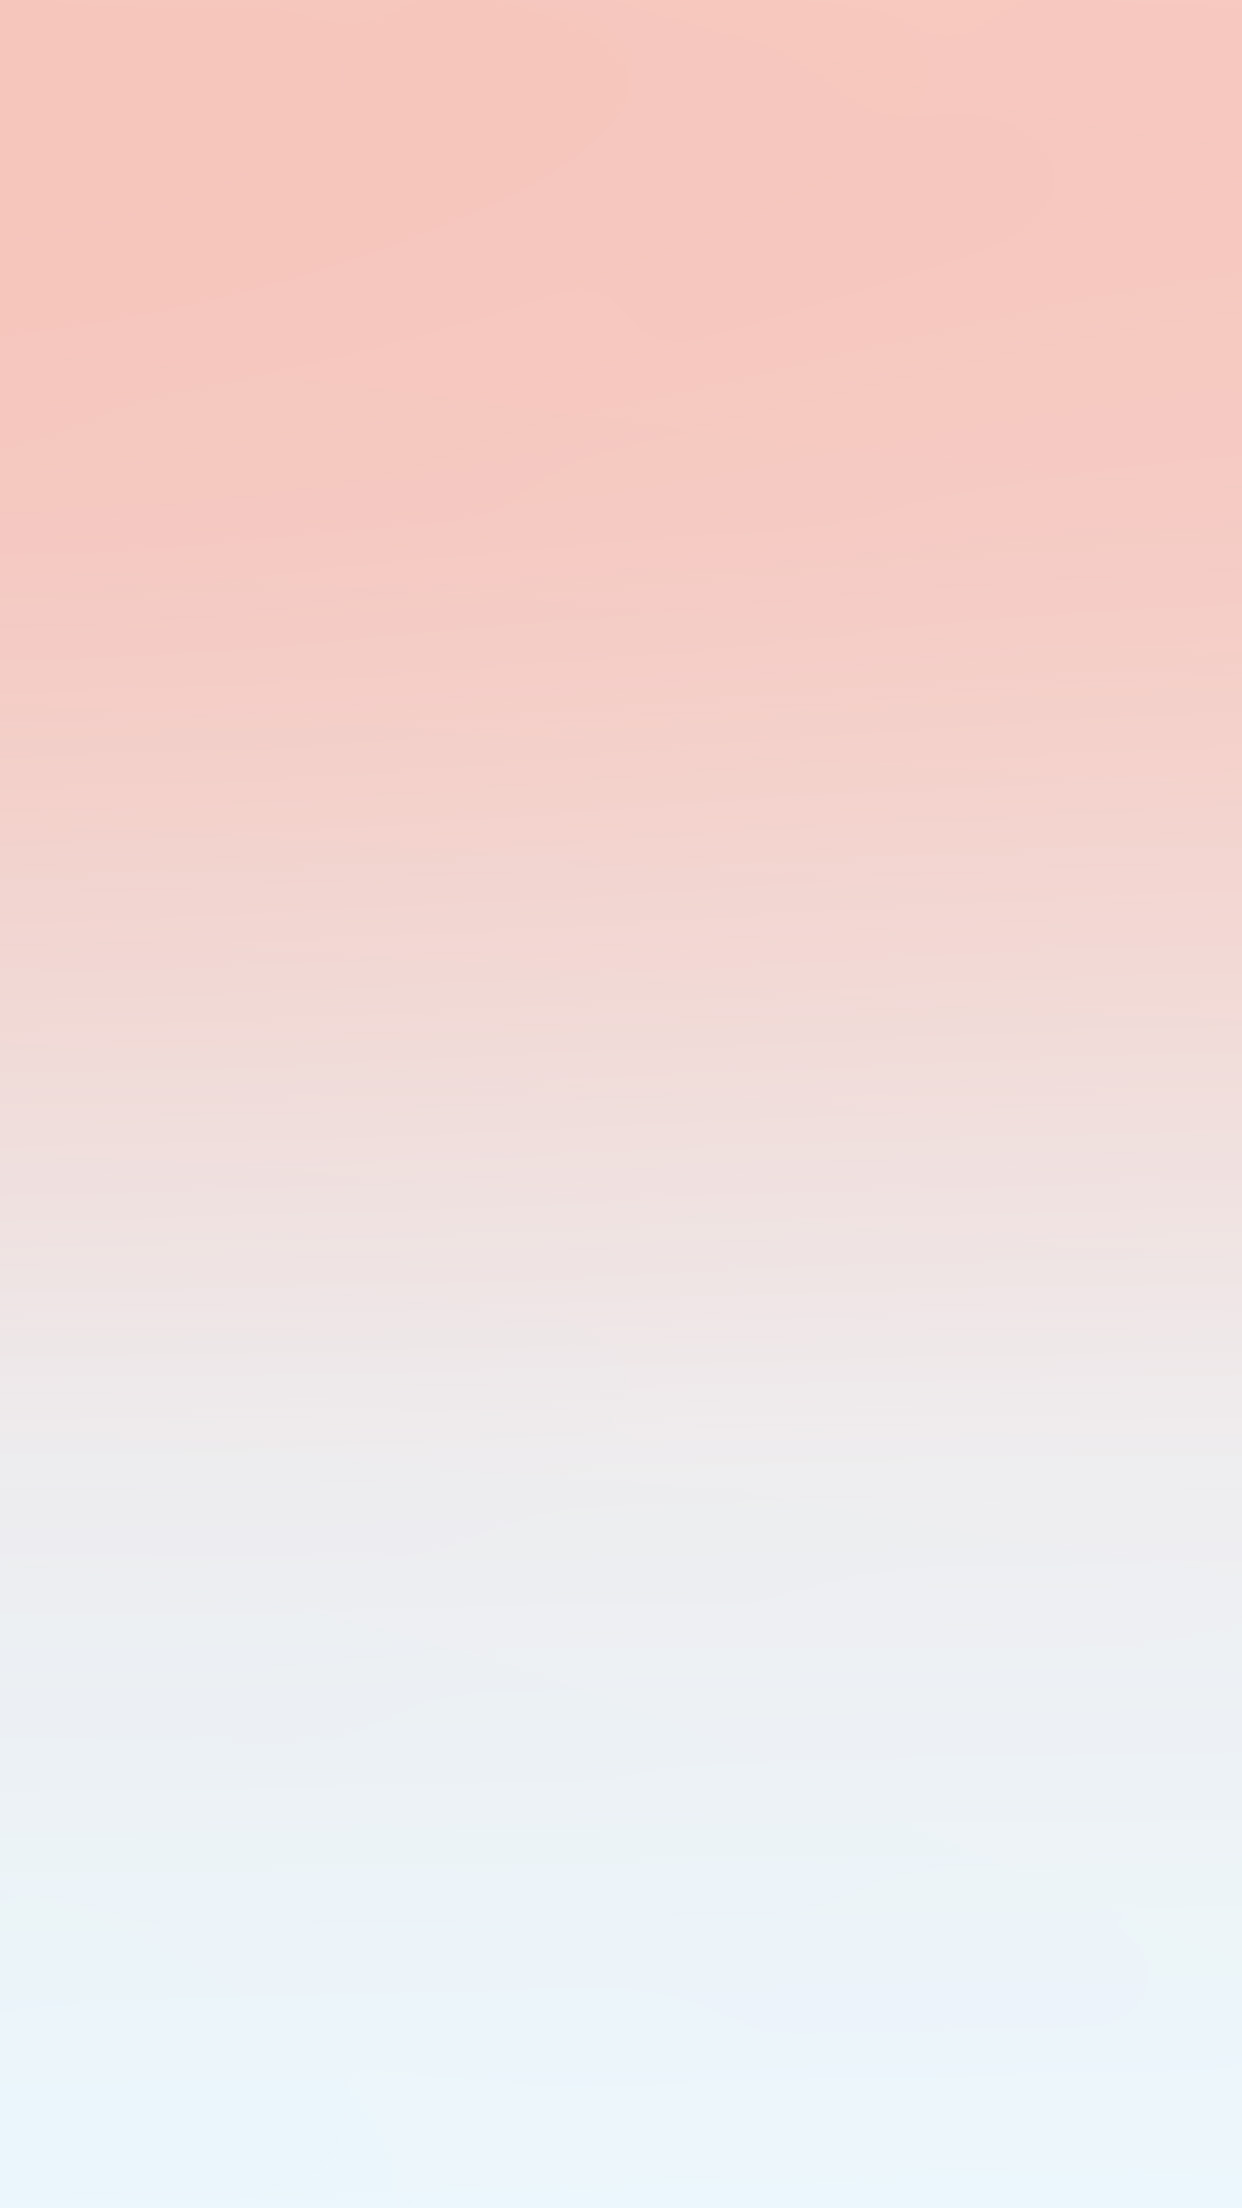 Wallpaper Iphone 6 Hd Pastel